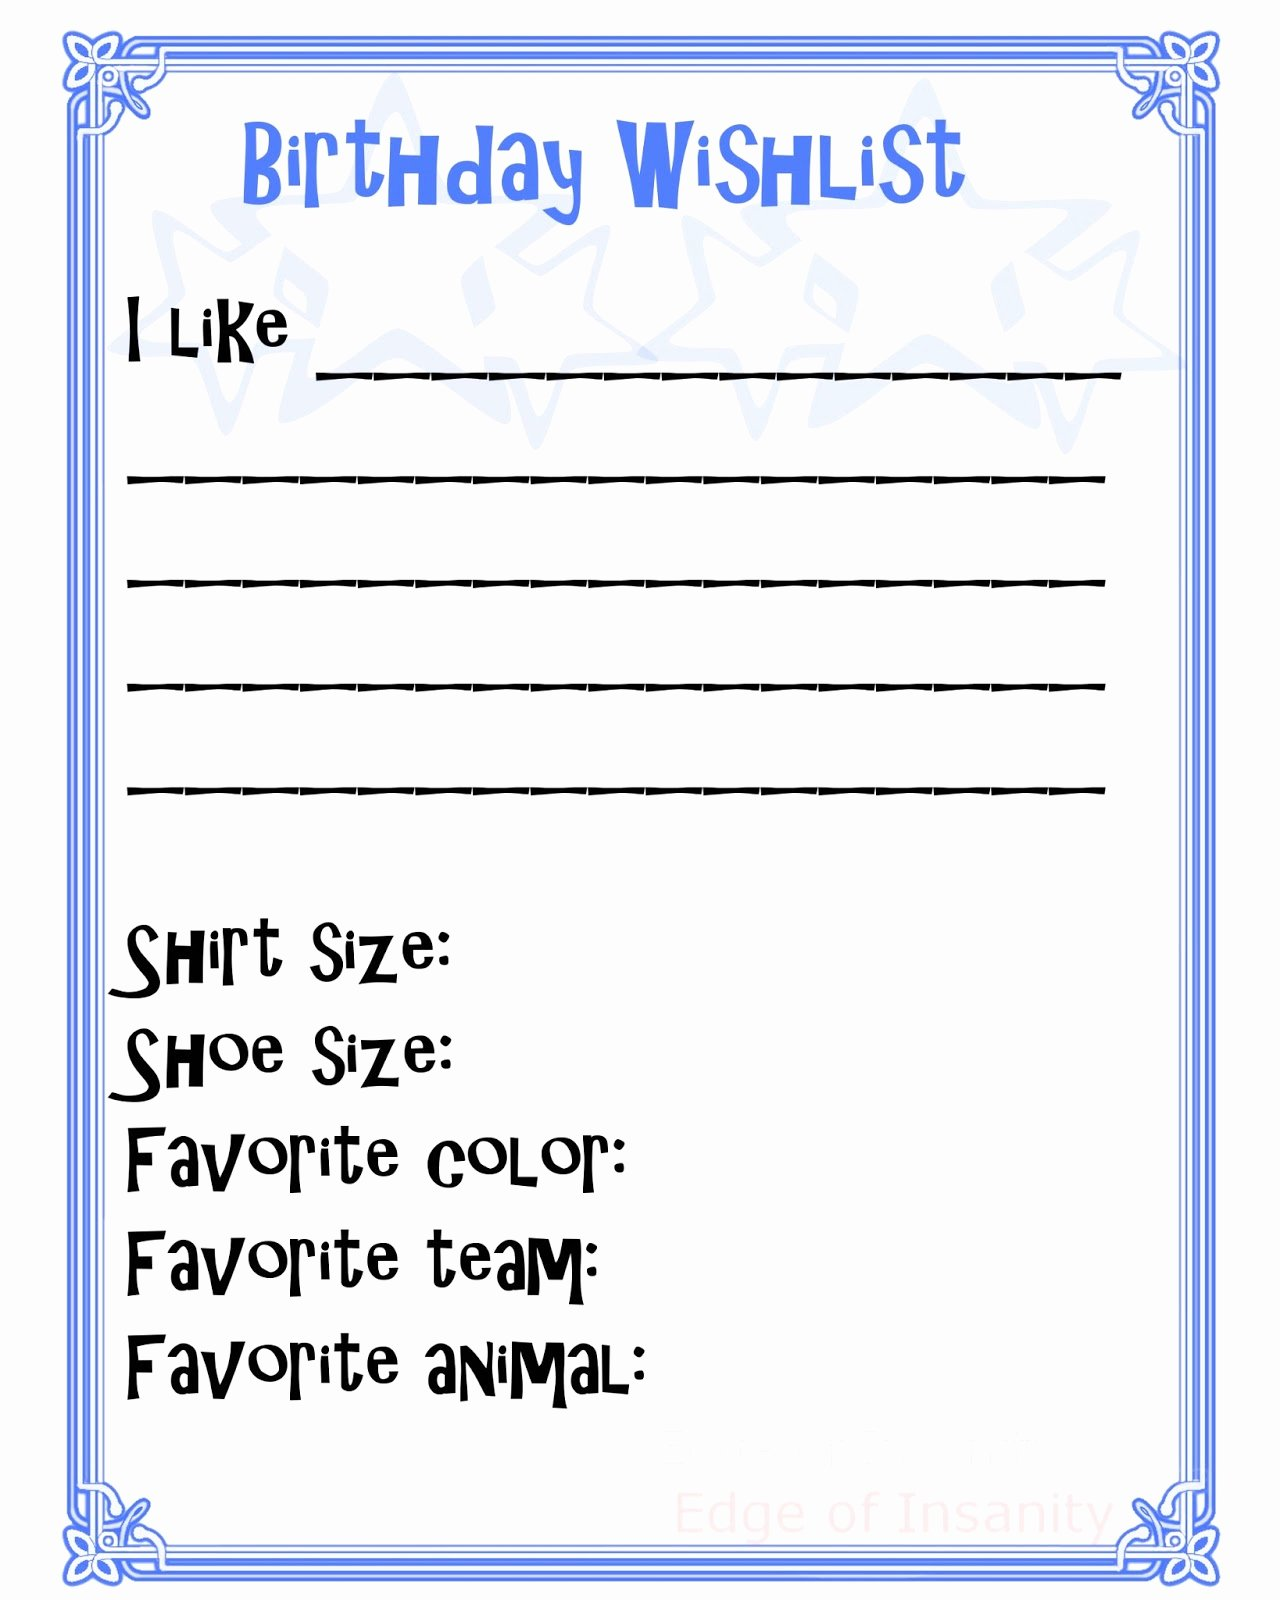 Birthday Wish List Template Fresh 6 Best Of Wish List Printable Free Printable